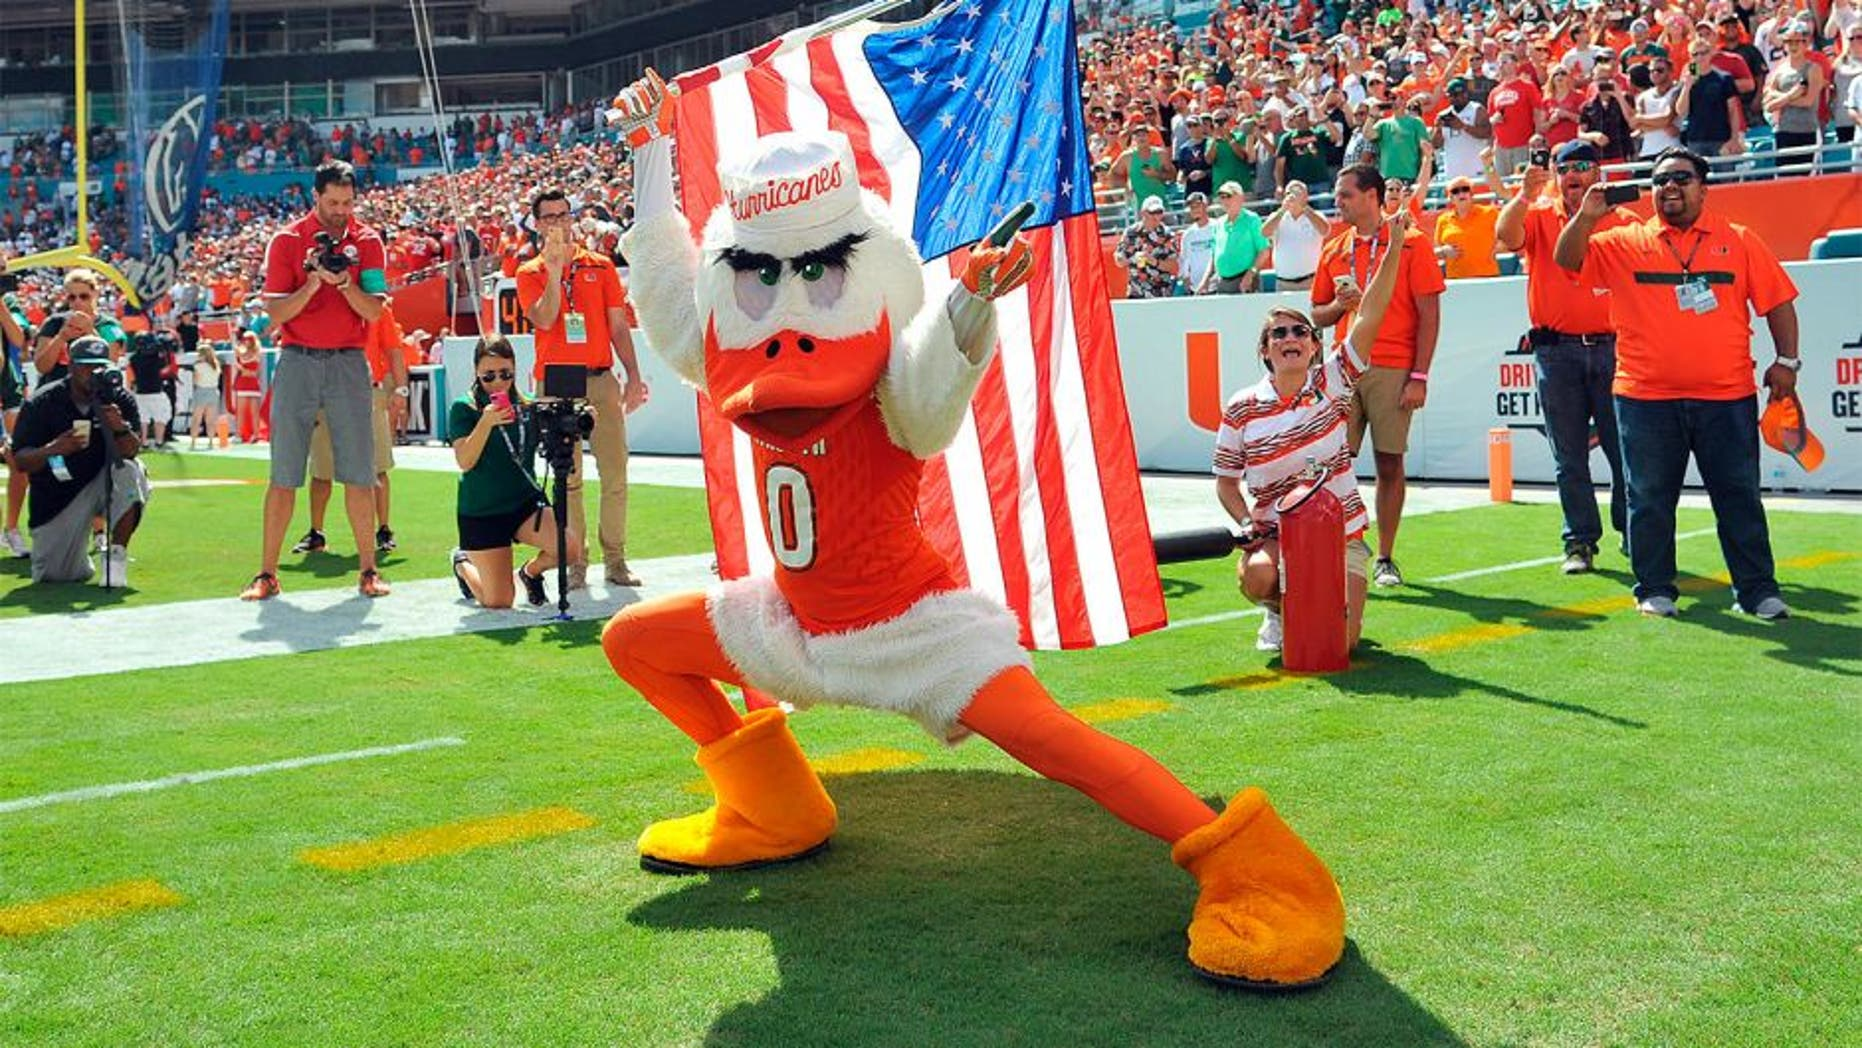 Sep 19, 2015; Miami Gardens, FL, USA; Miami Hurricanes mascot Sebastian carries the American flag before a game against Nebraska Cornhuskers at Sun Life Stadium. Miami won 36-33. Mandatory Credit: Steve Mitchell-USA TODAY Sports